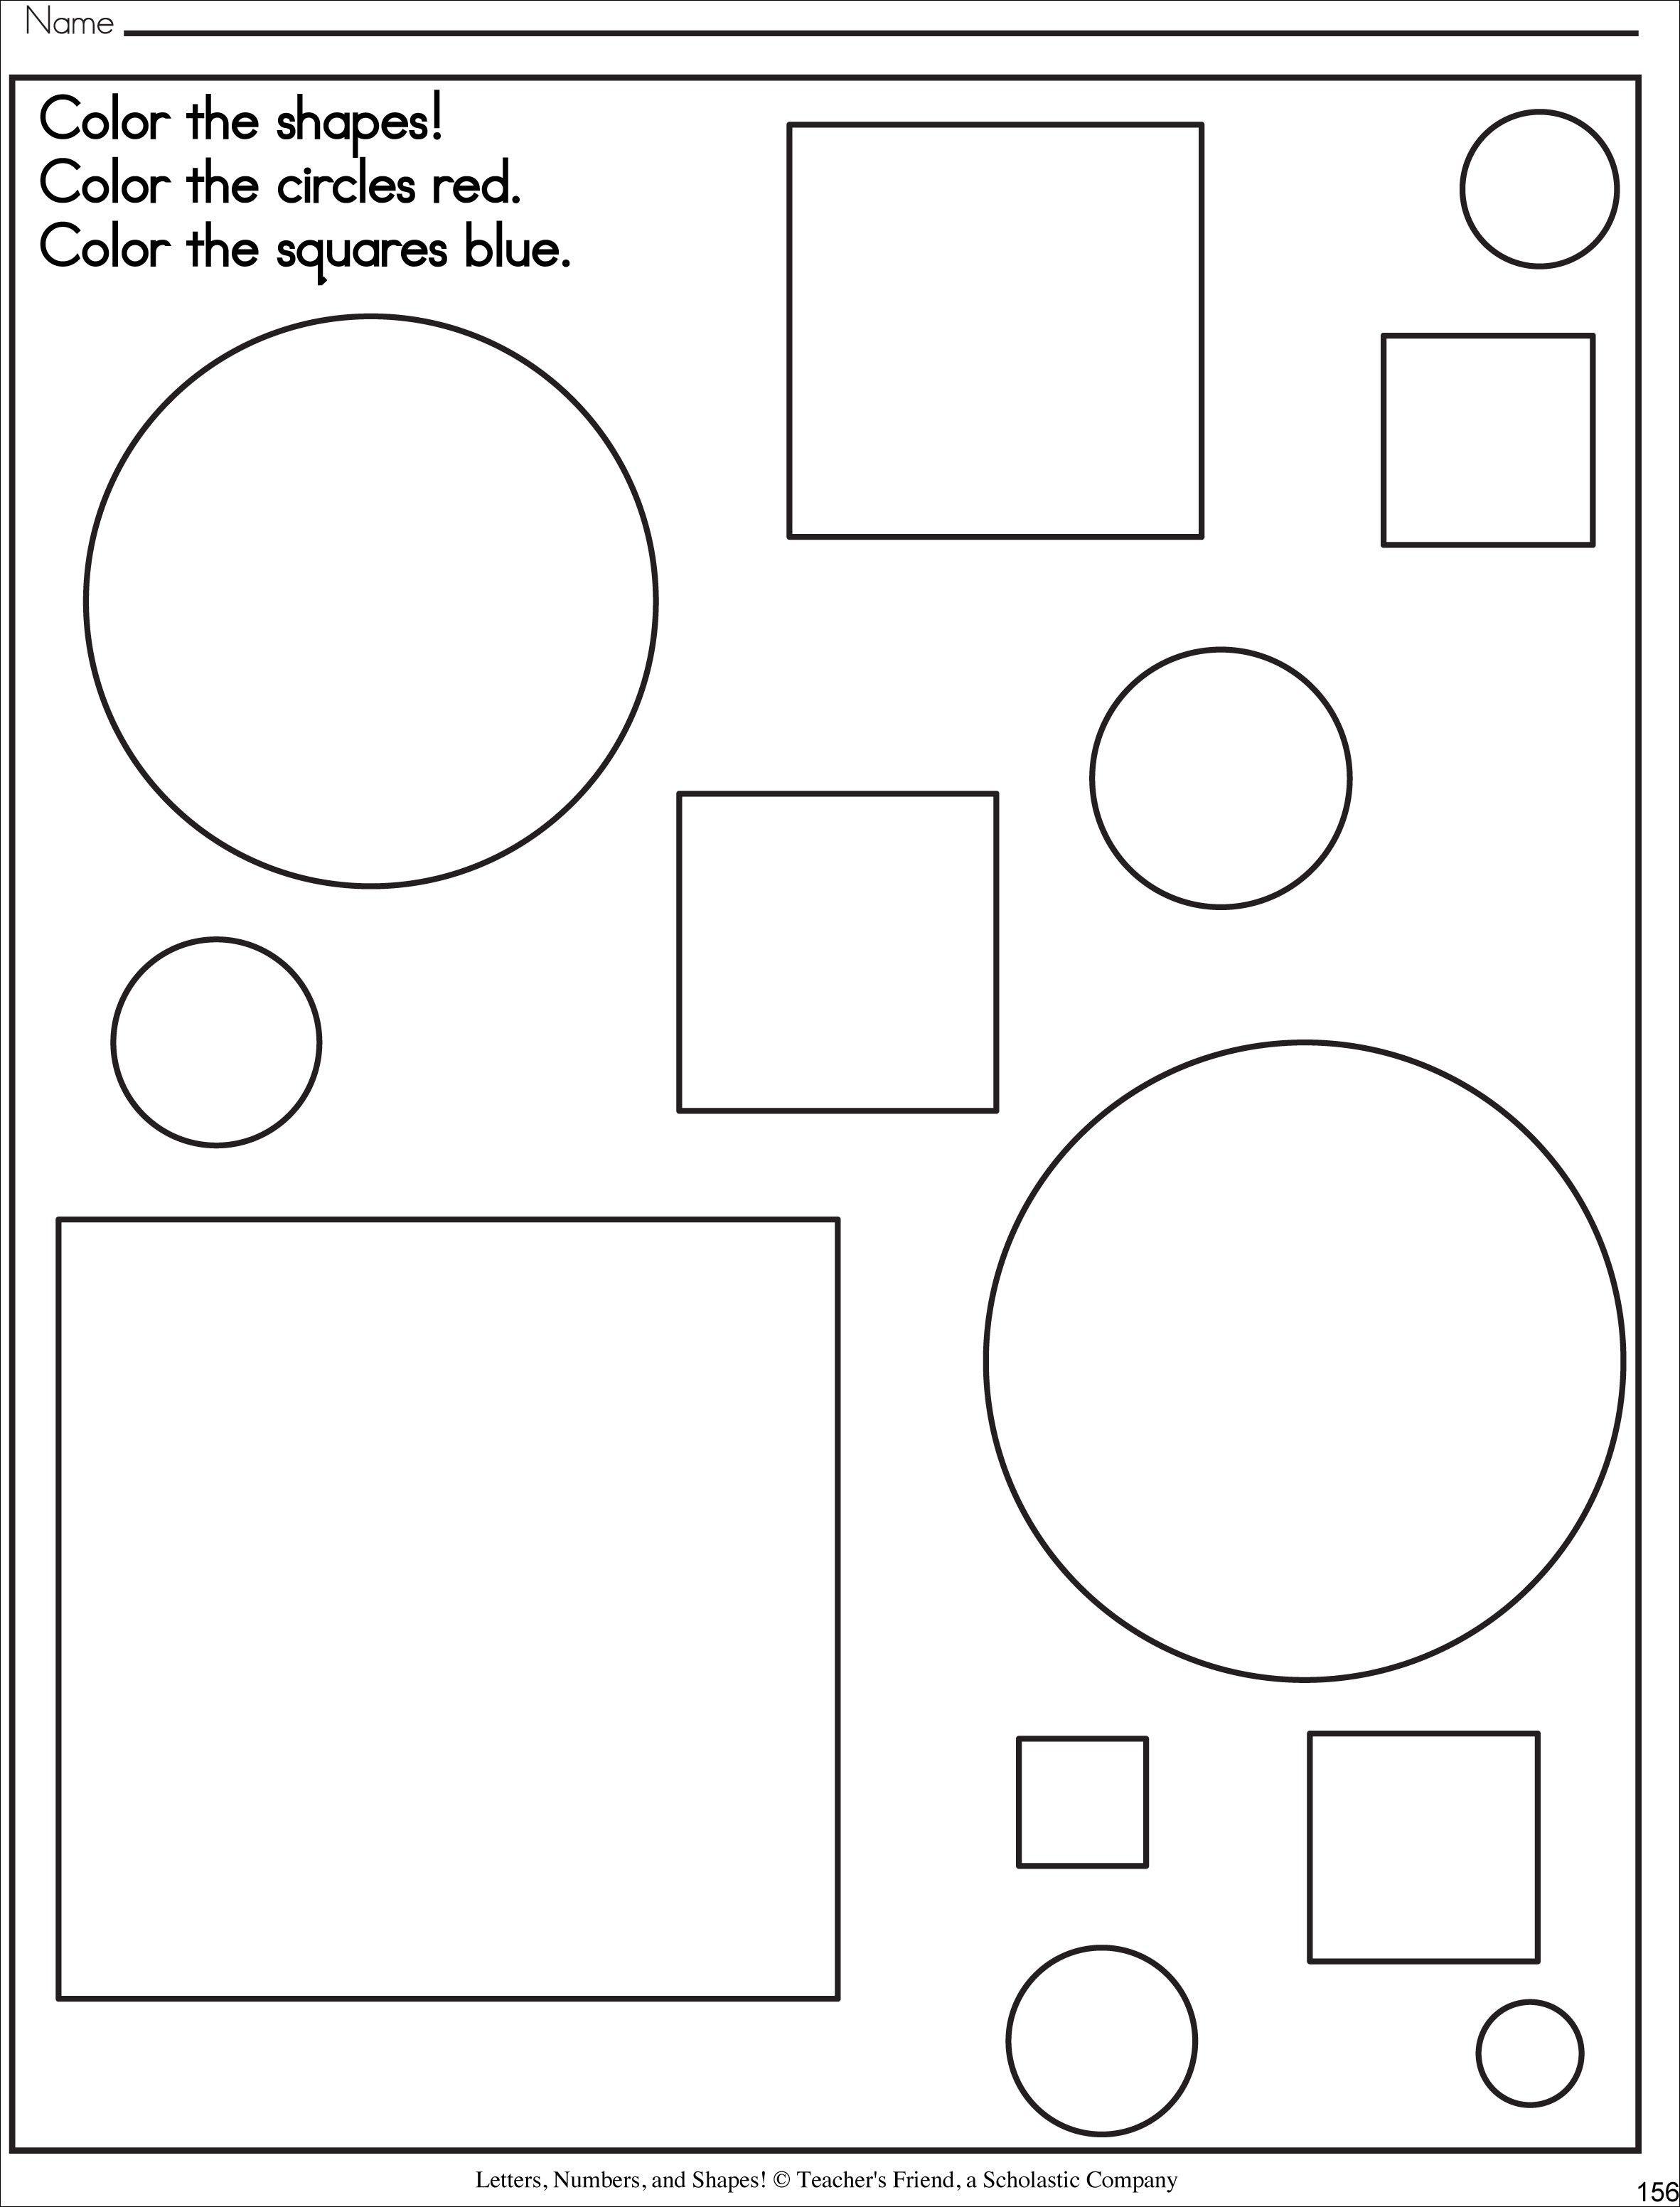 Pin By Carolin Chubinsky On Preschool Shapes